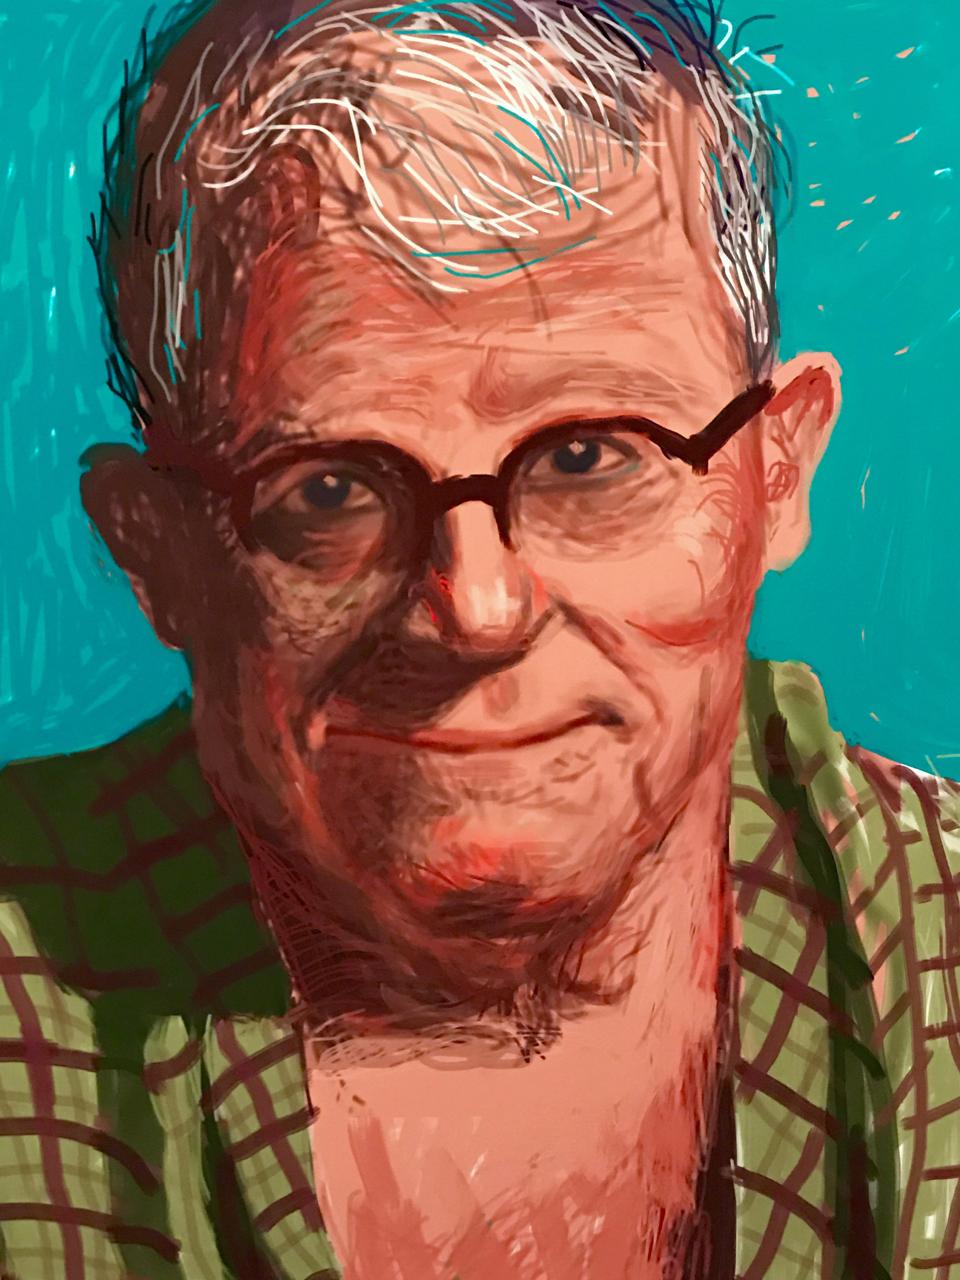 Wonderful portrait